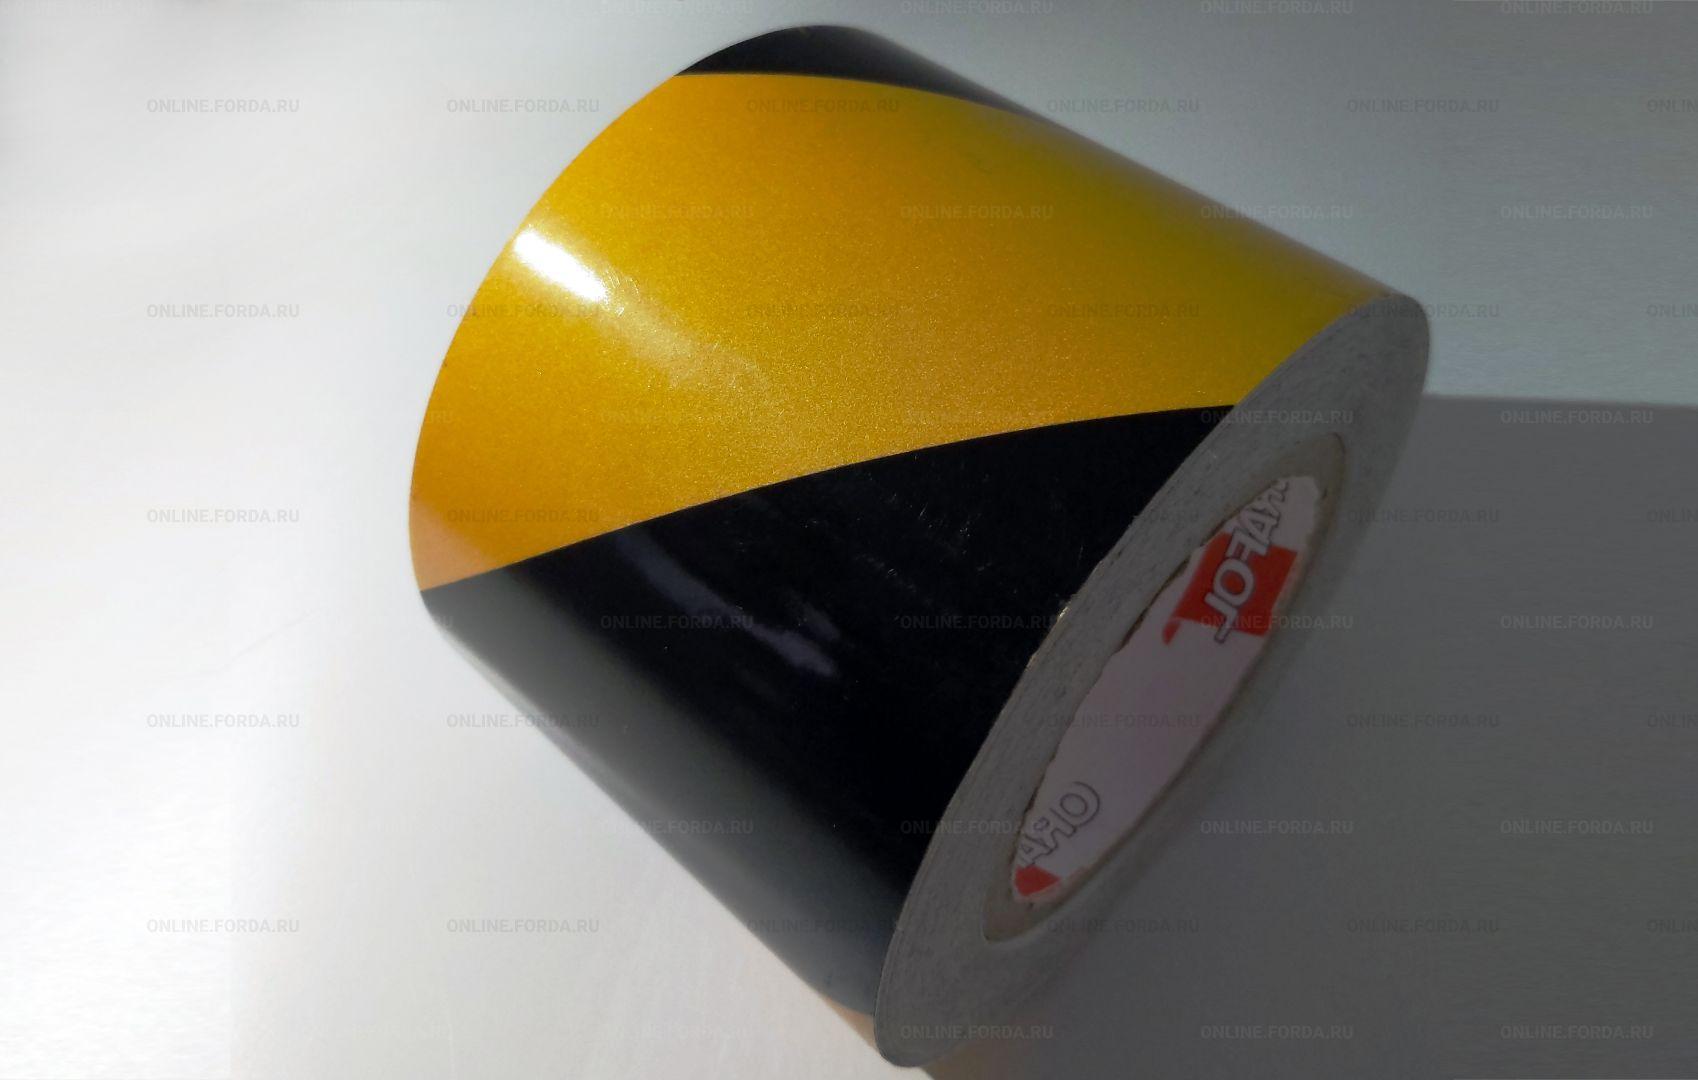 Световозвращающая сигнальная лента ORALITE 5431 IND DR